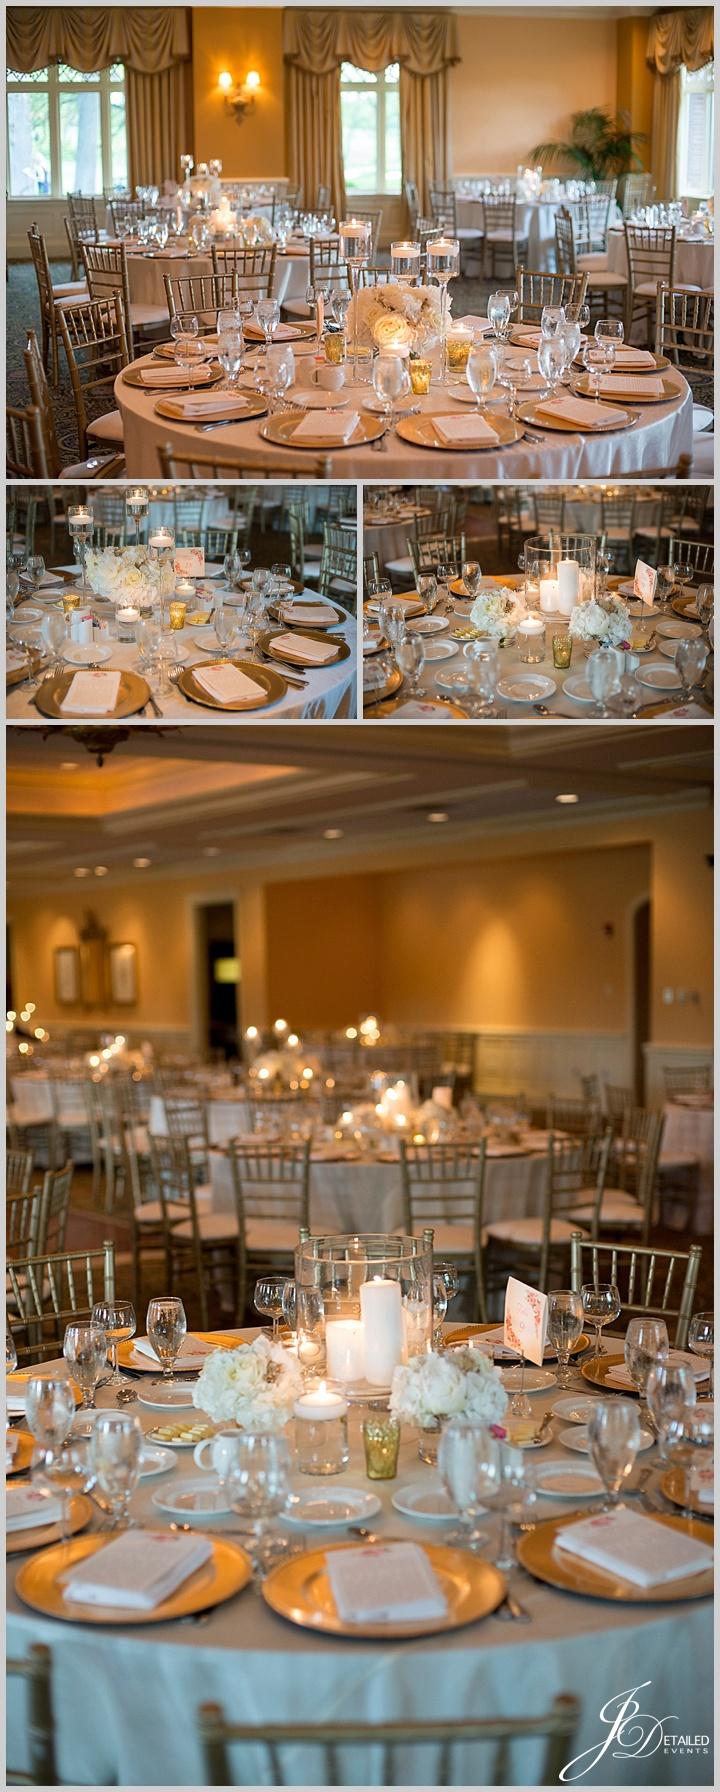 jdetailed-events-chicago-wedding-planner_0619